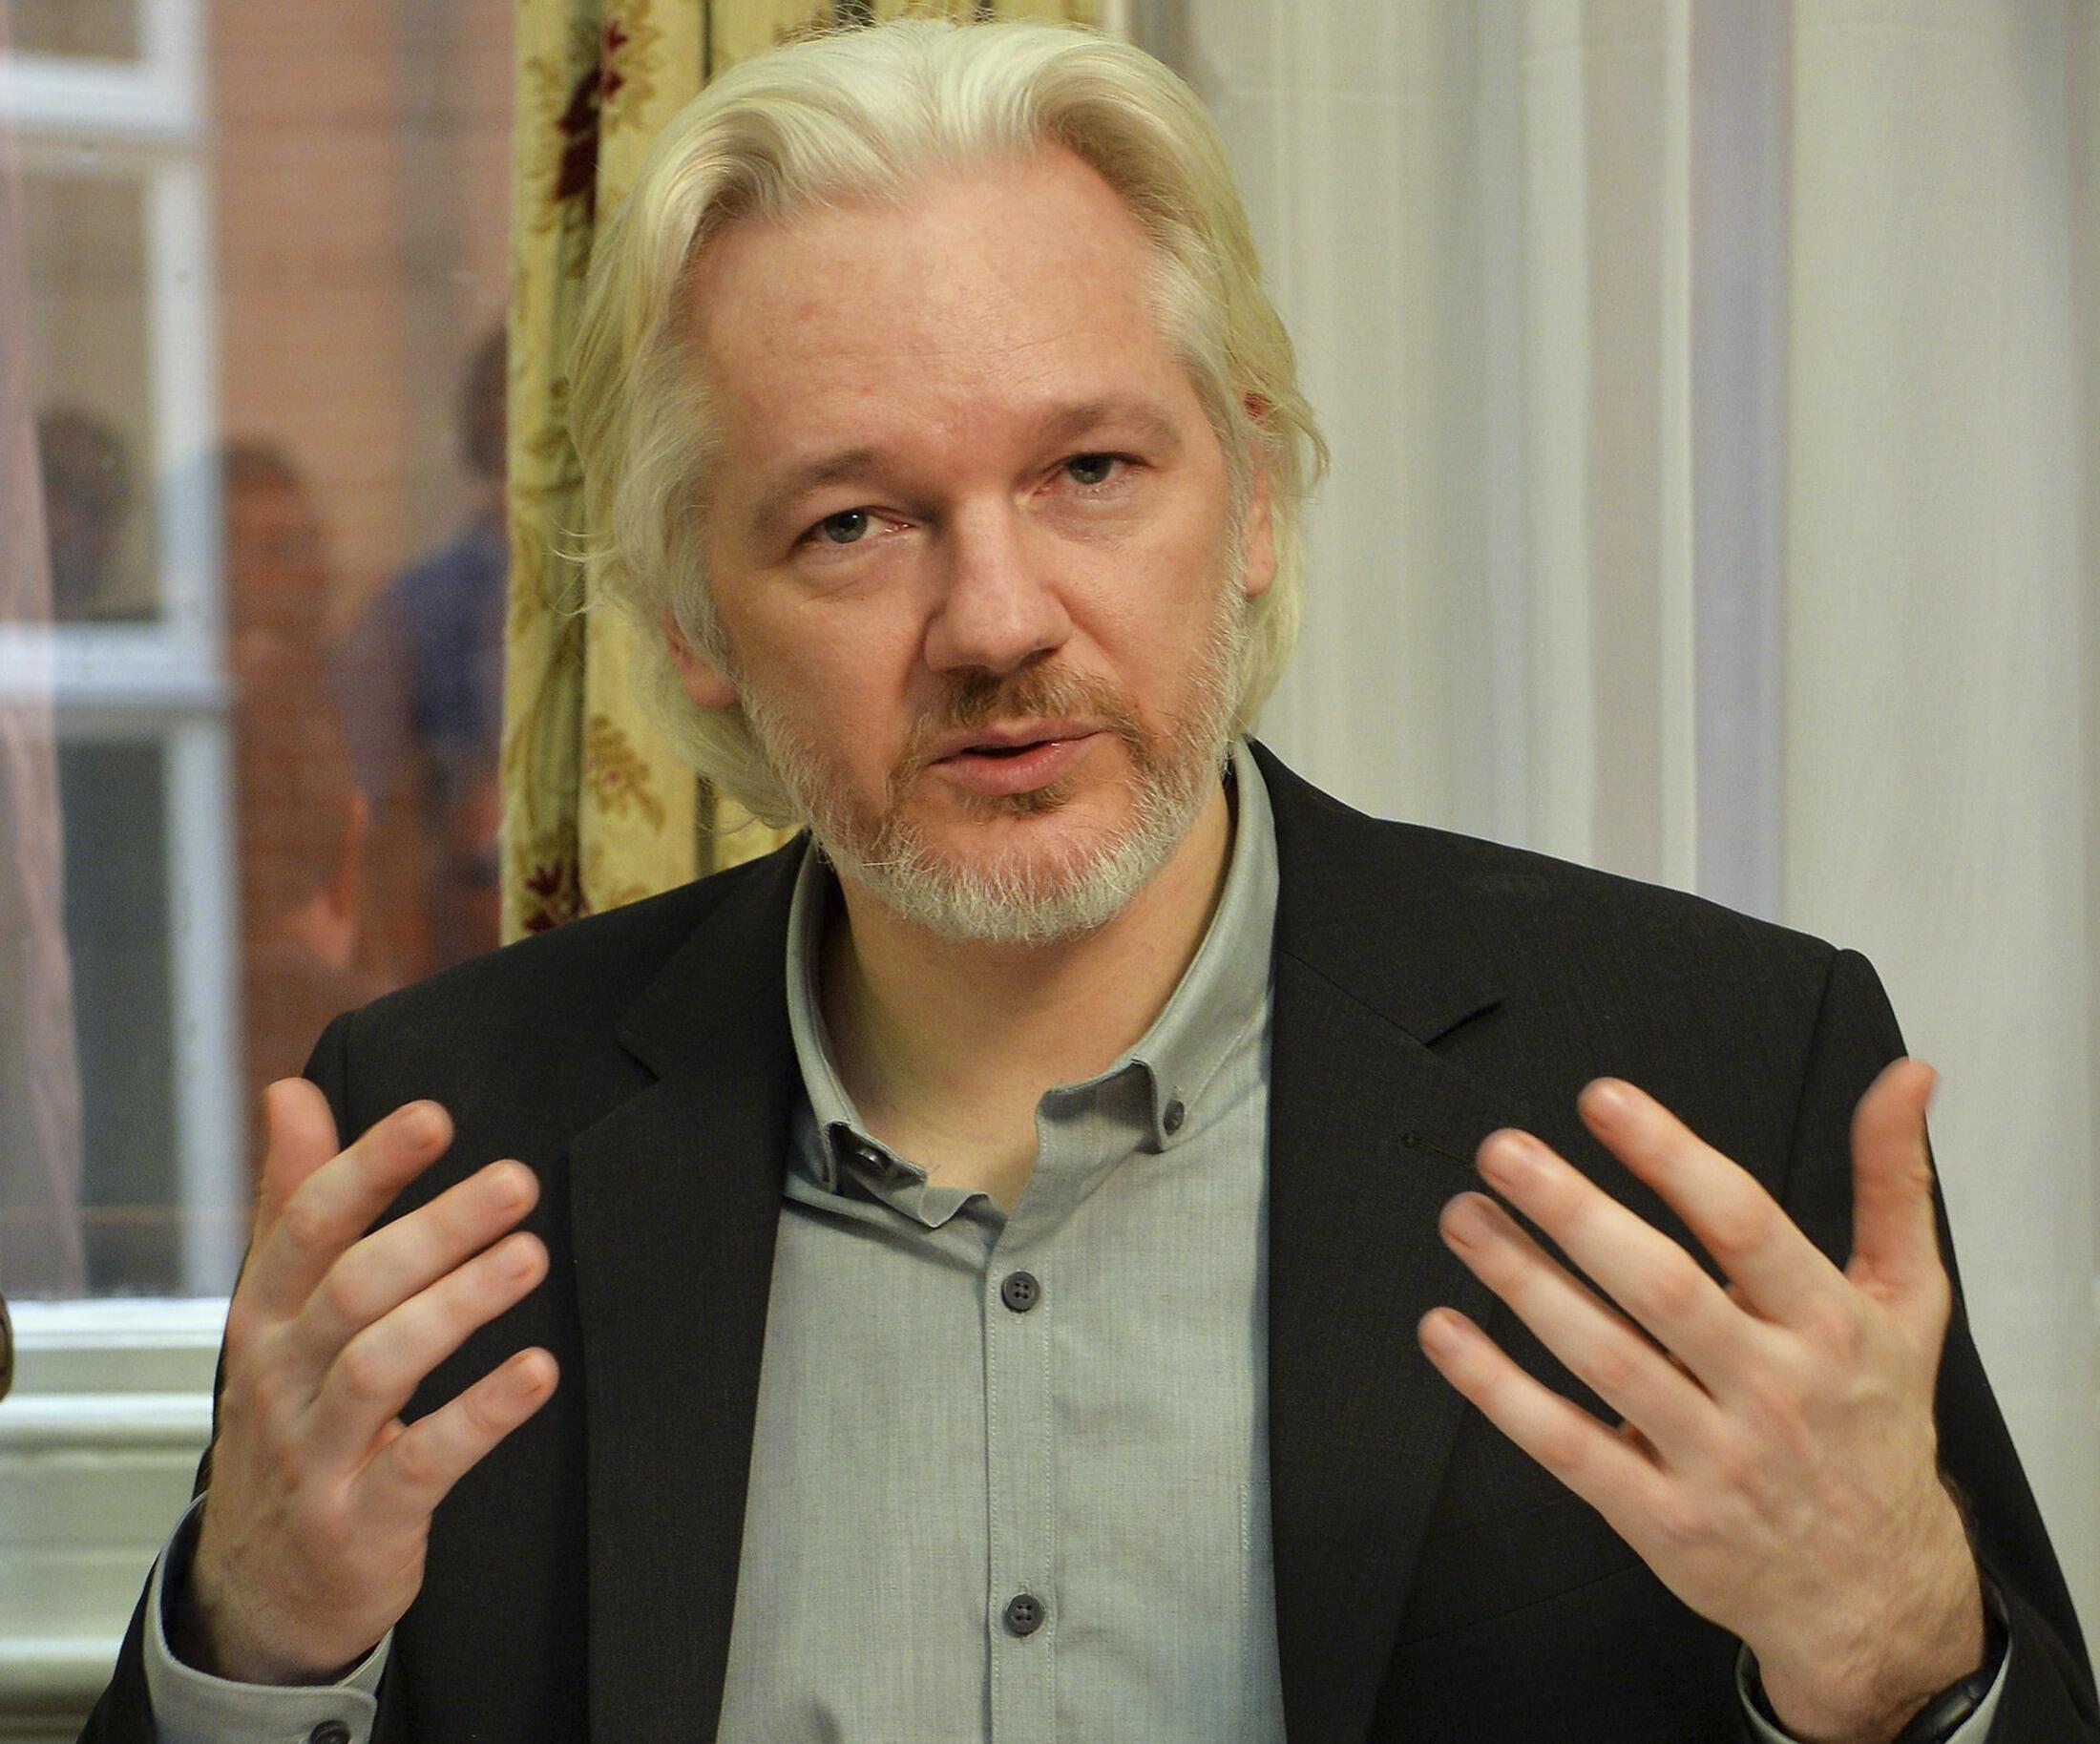 Julian Assange at the Ecuadorian embassy in London, 18 August, 2014